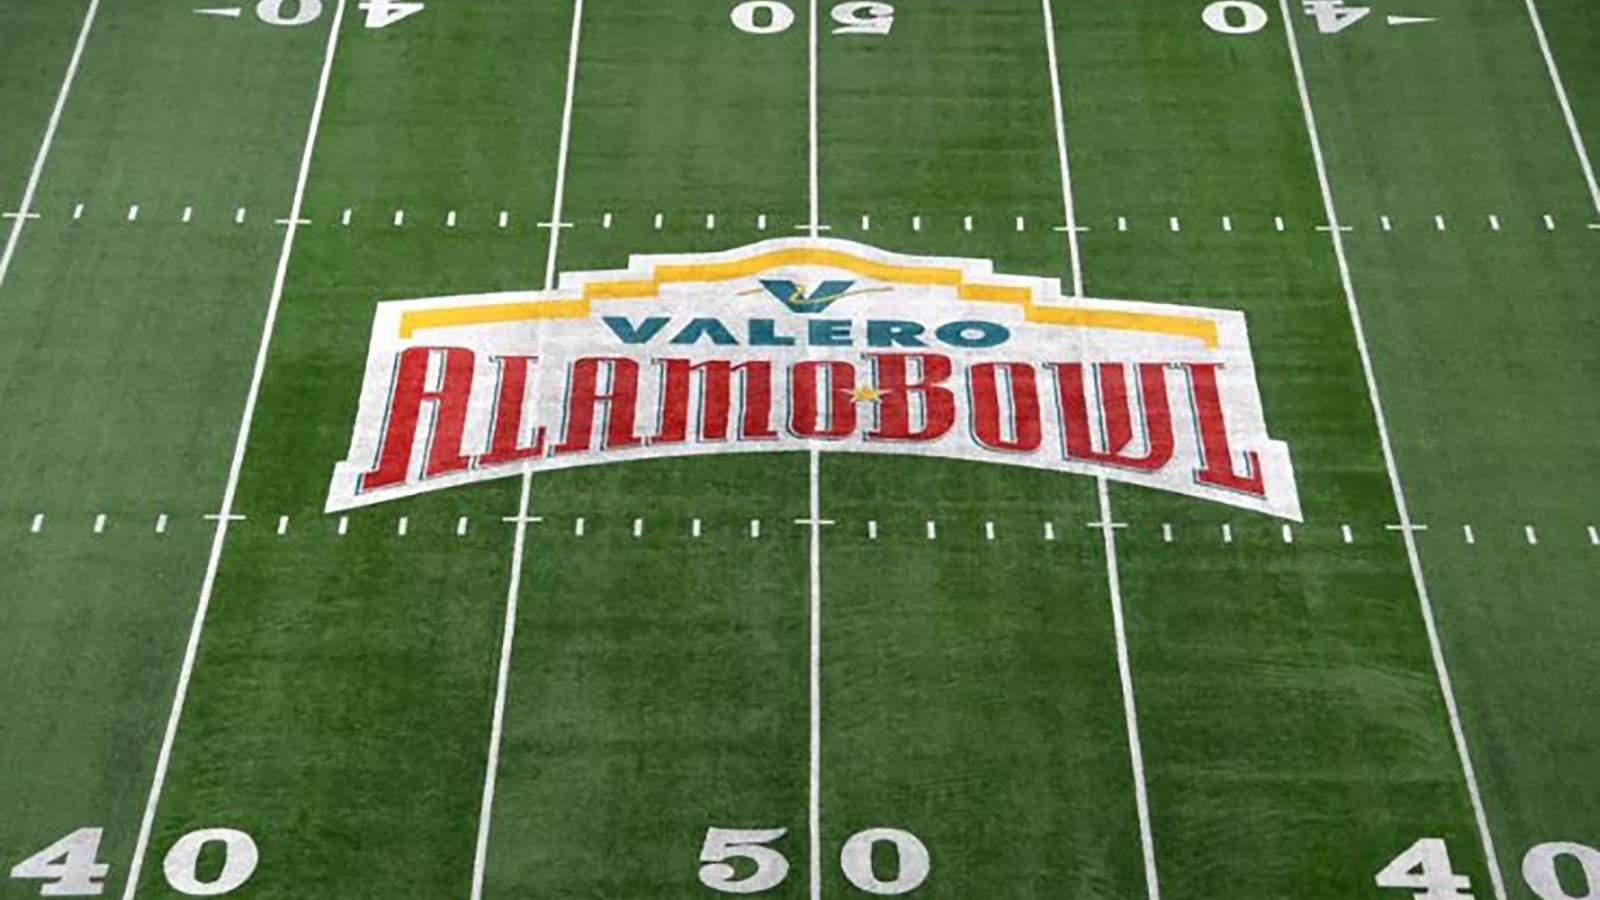 2020 Alamo Bowl (Reduced Capacity, Social Distancing)